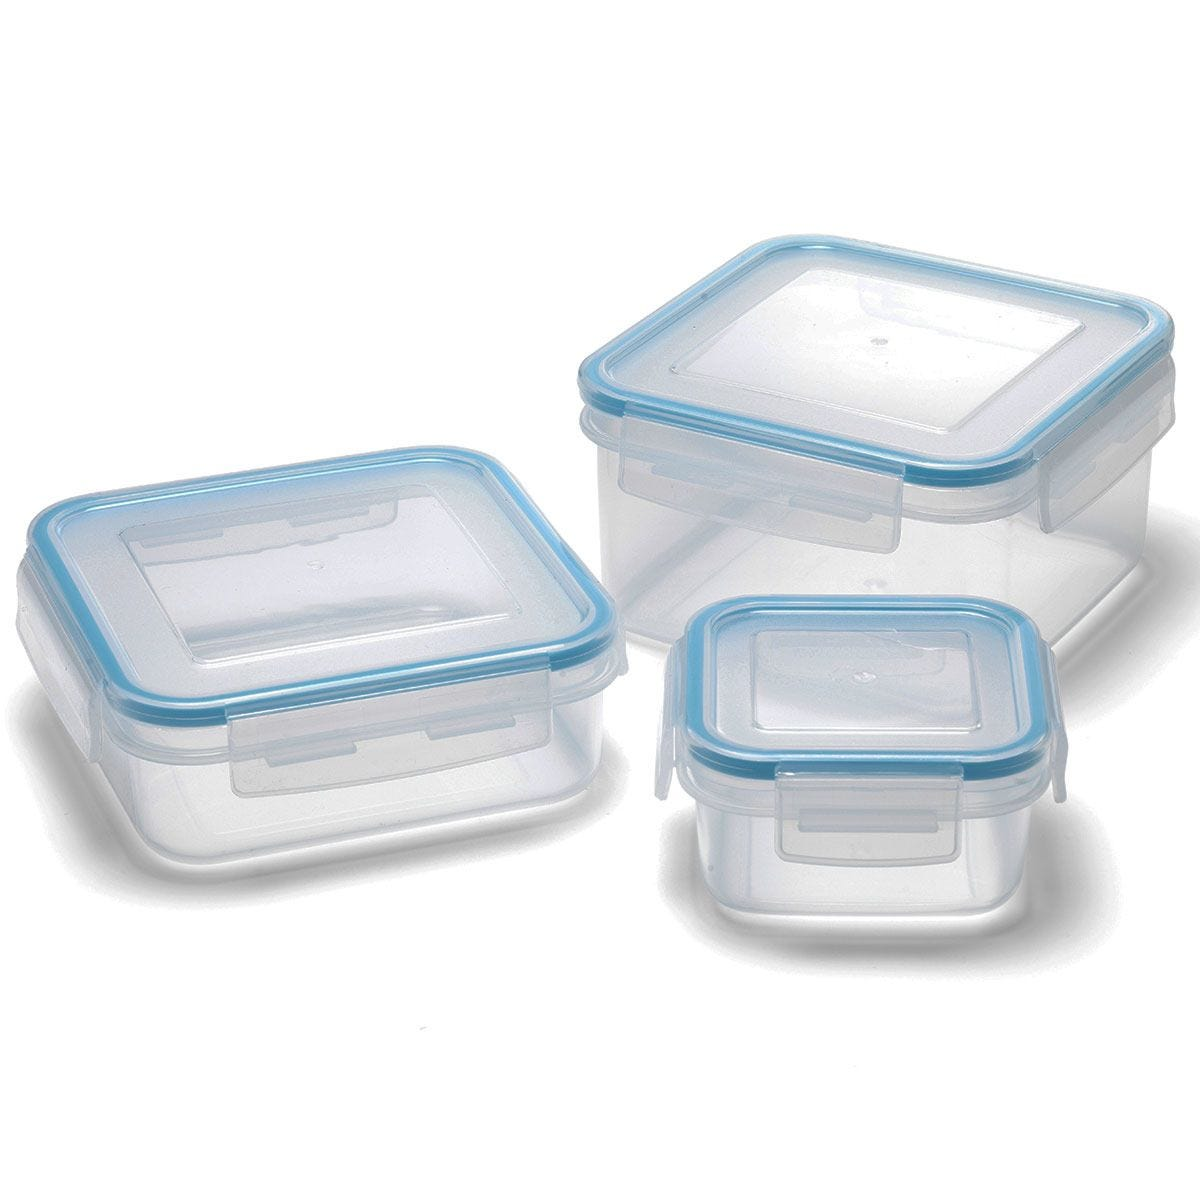 Addis Clip & Close 3 Piece Square Food Container Food Set